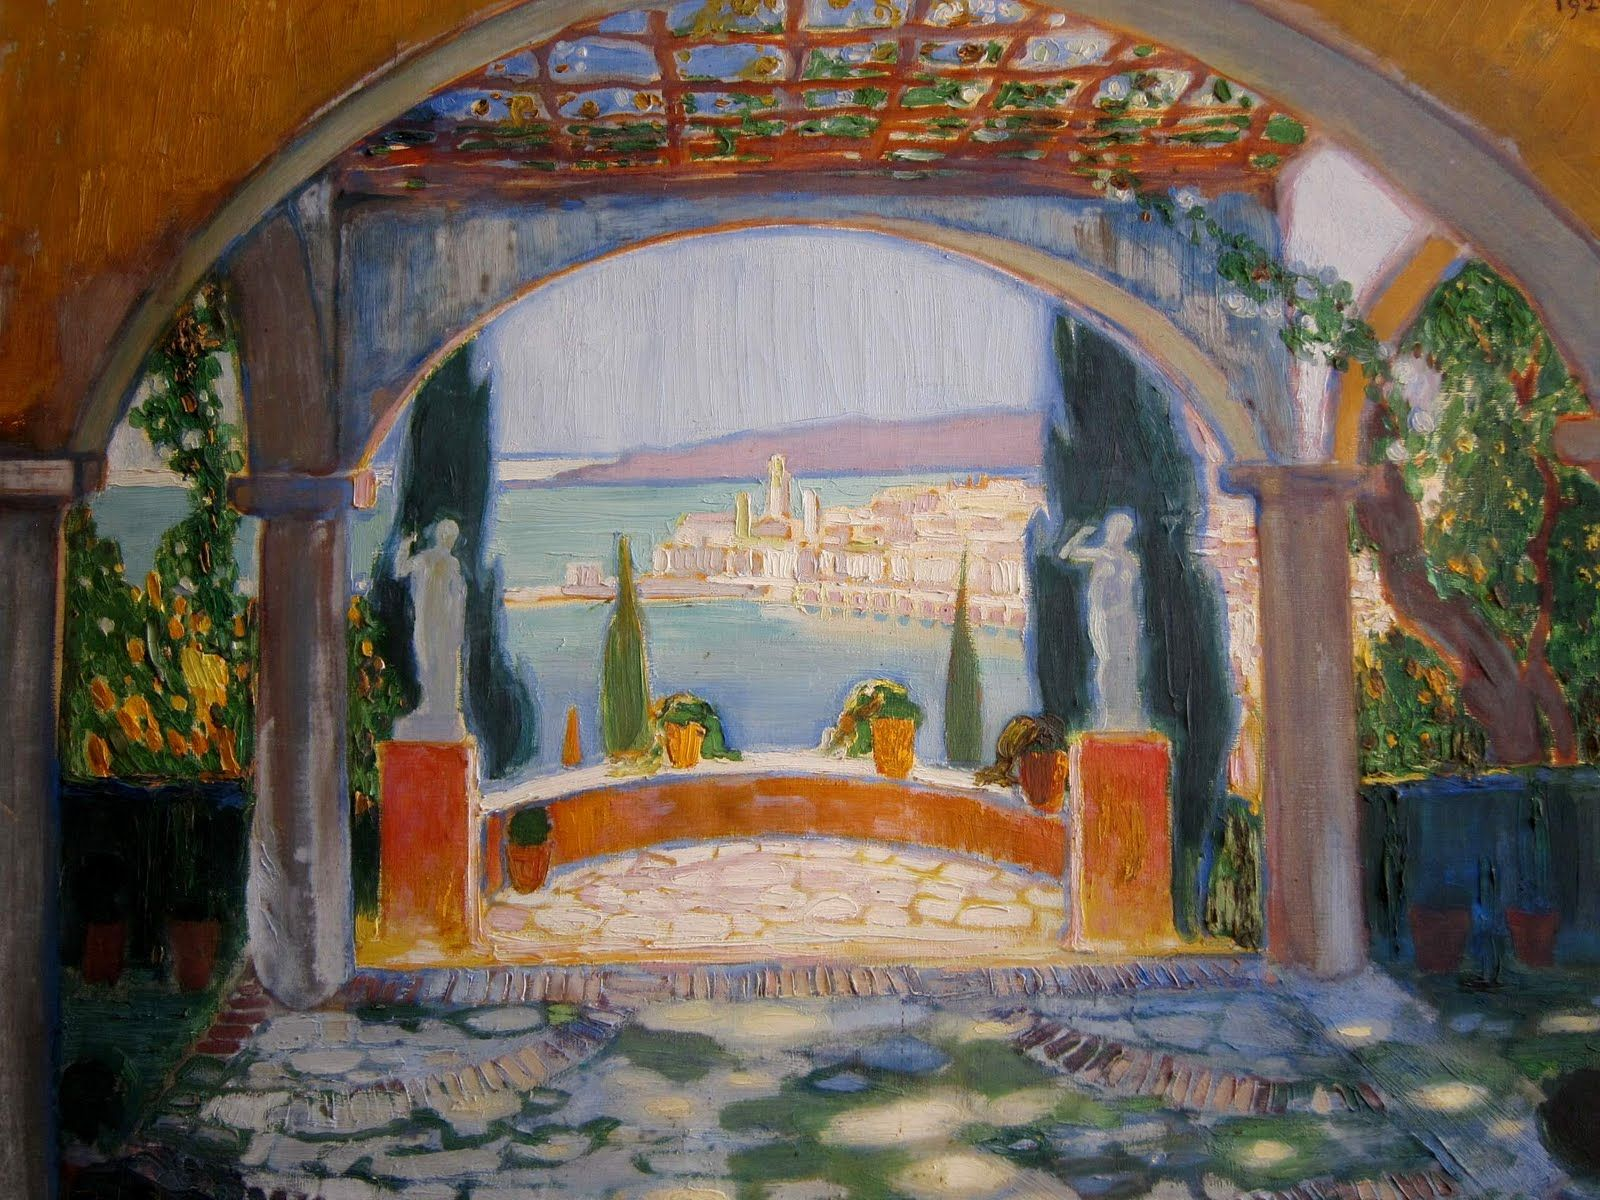 Ferdinand Bac 1859 1952 Bac s painting of his Le Jardin des